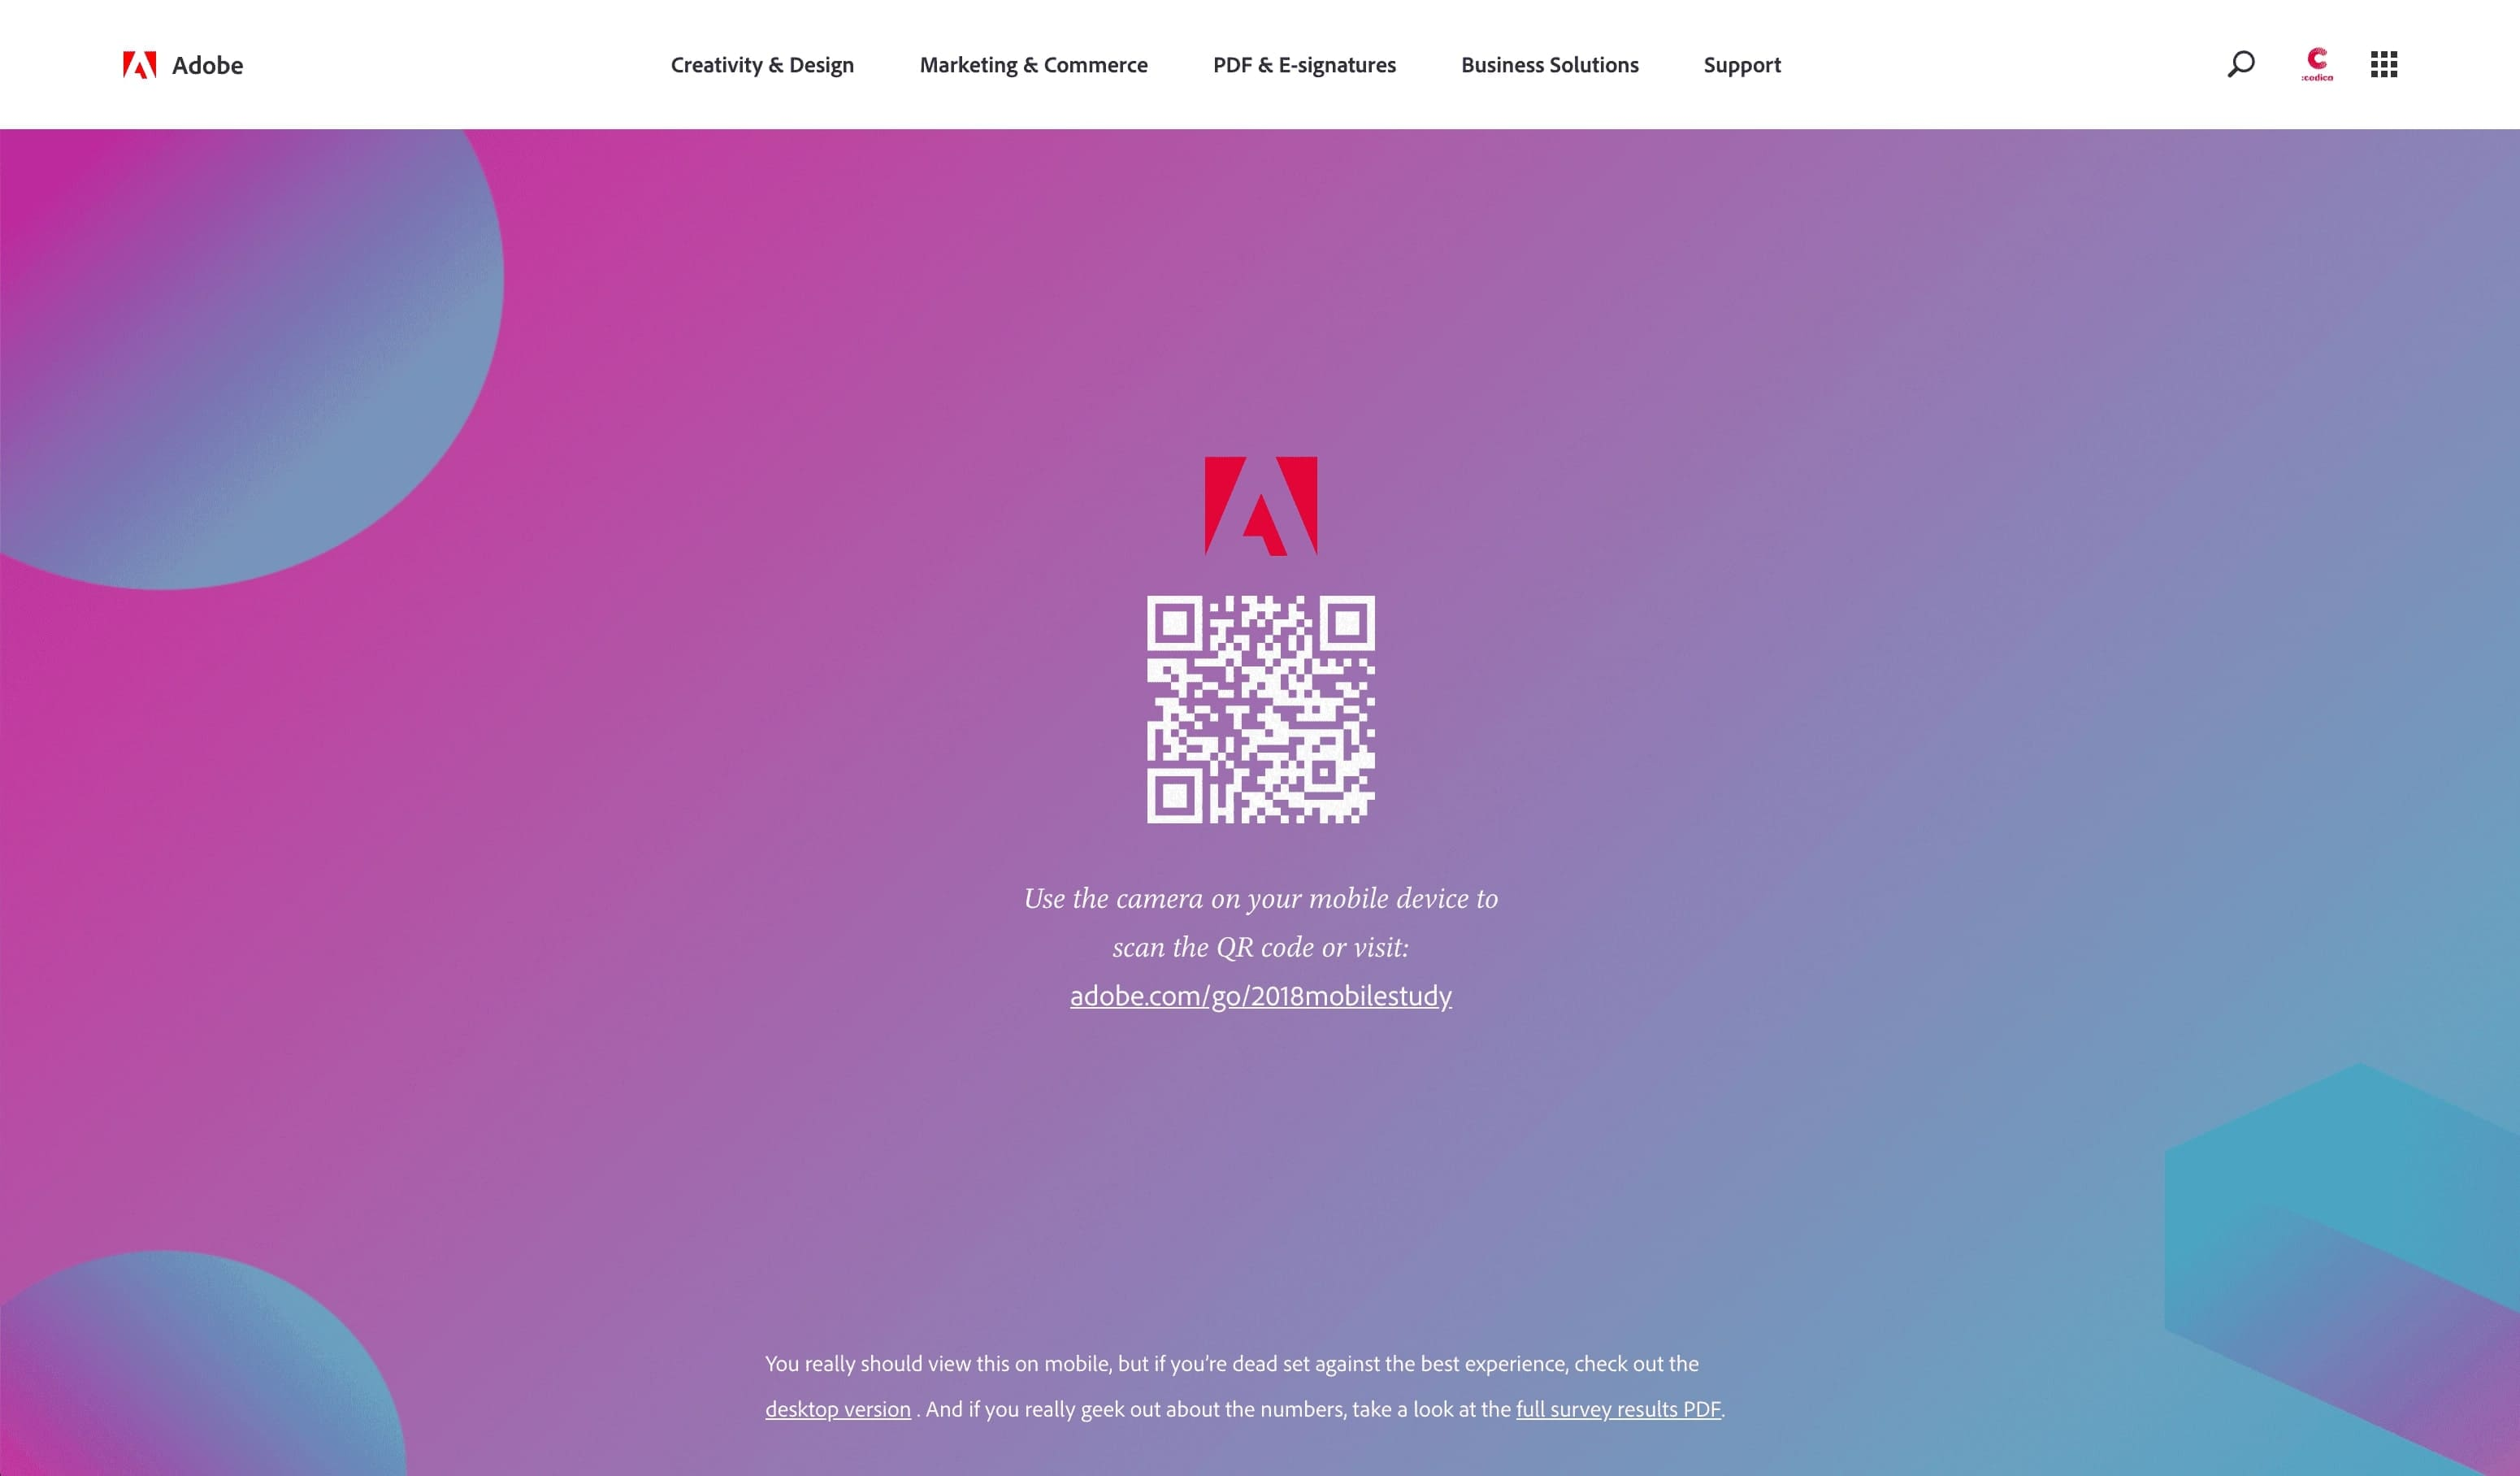 Hot web design trends: Mobile-first design, Adobe | Codica